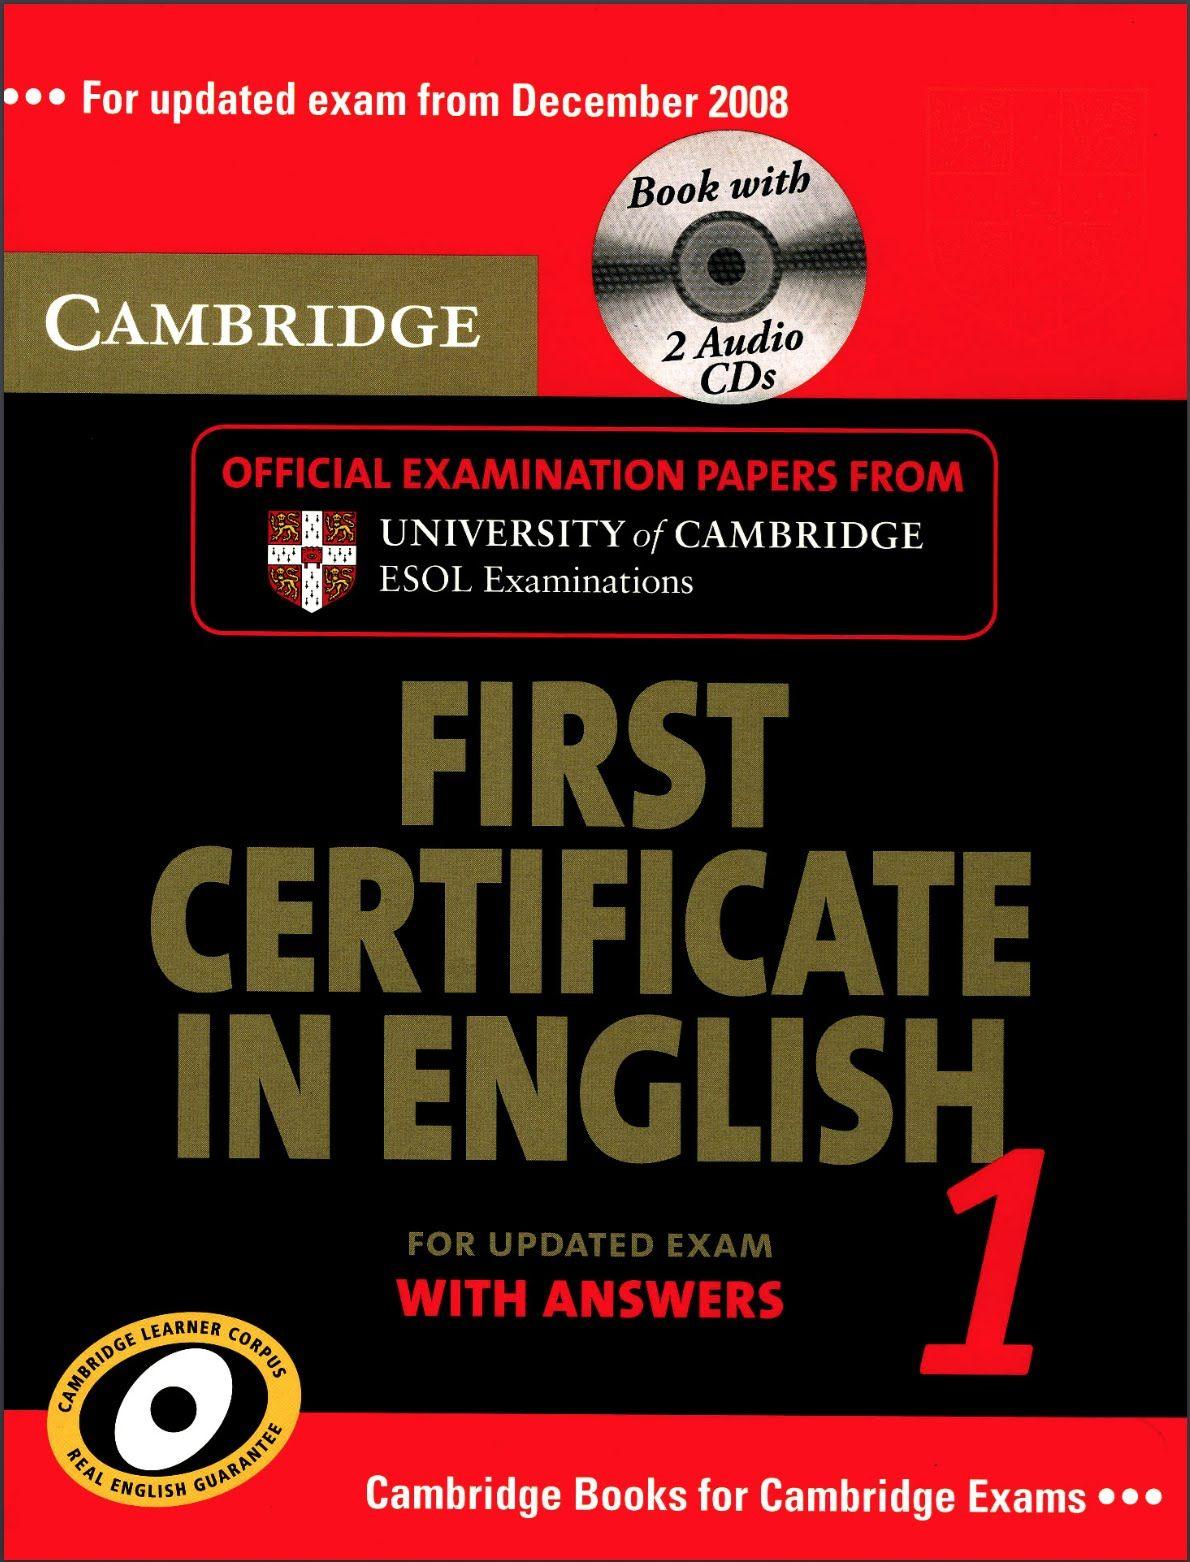 Listening B2 FCE 1 Test Part 4